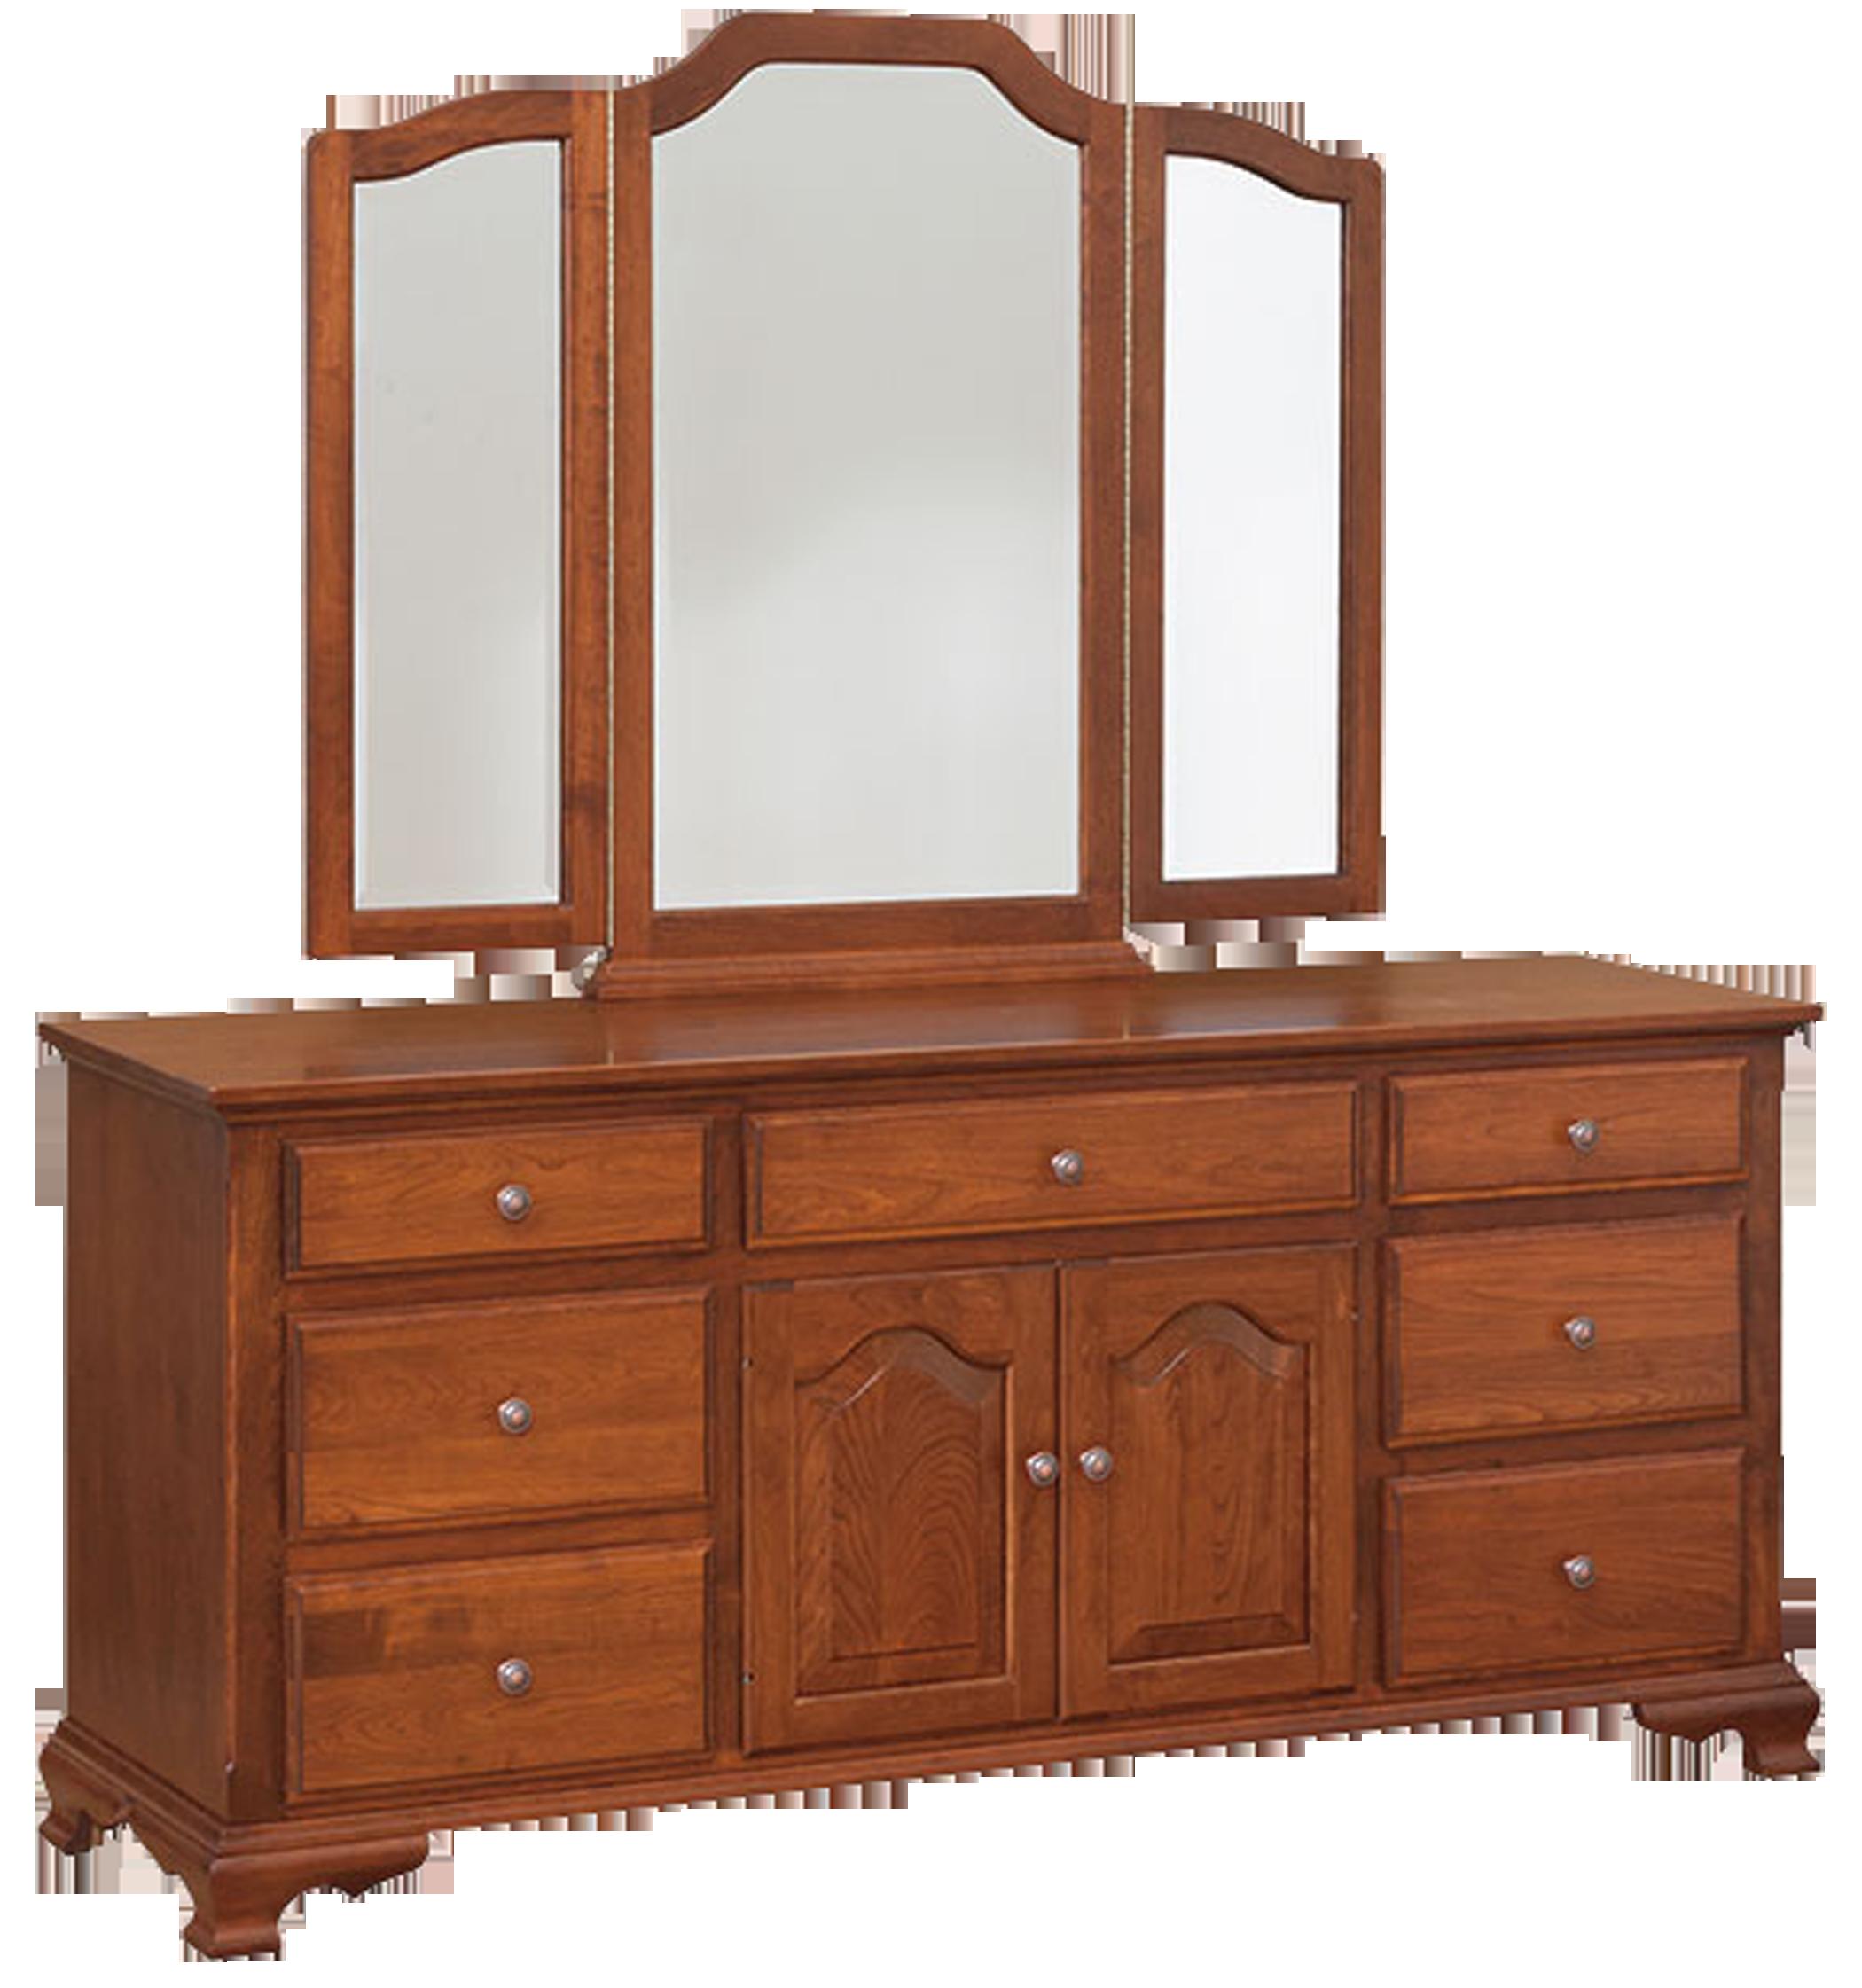 Furniture PNG - 26718